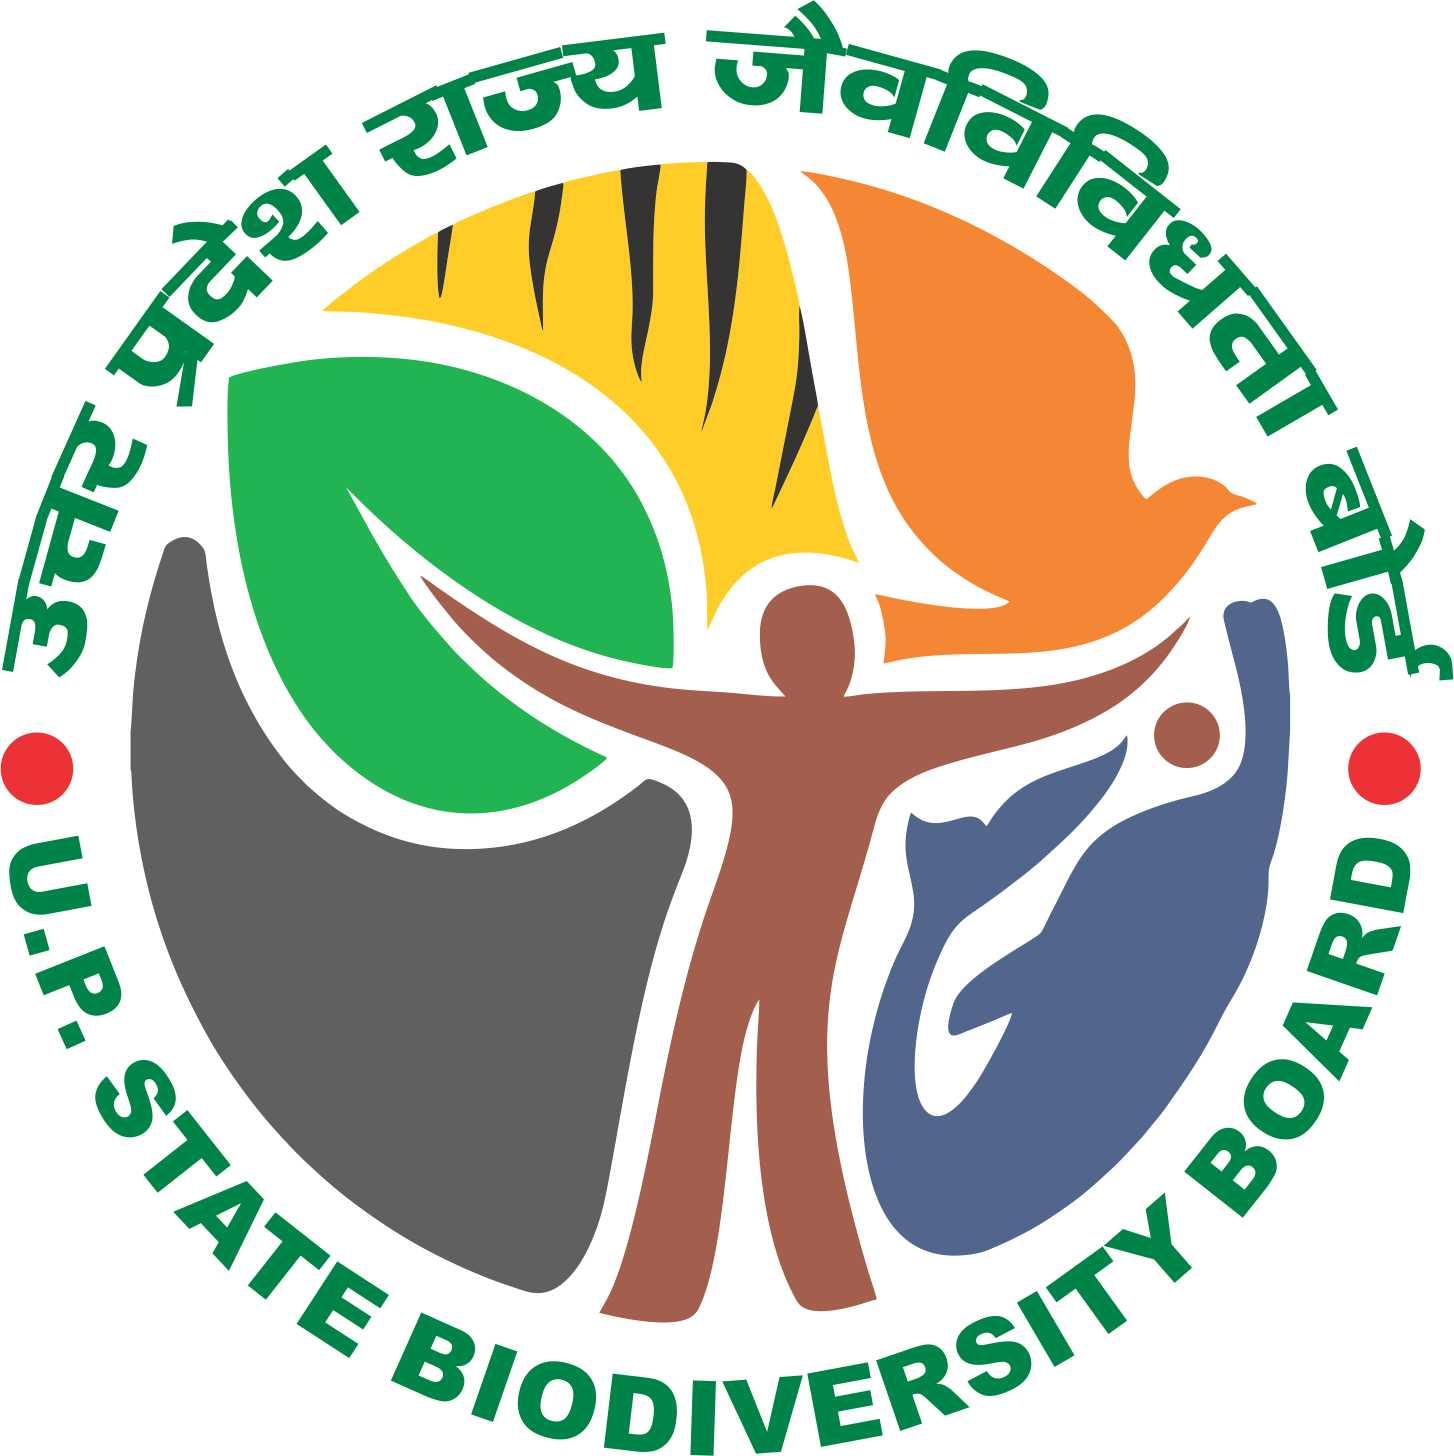 urbanization biodiversity and conservation pdf